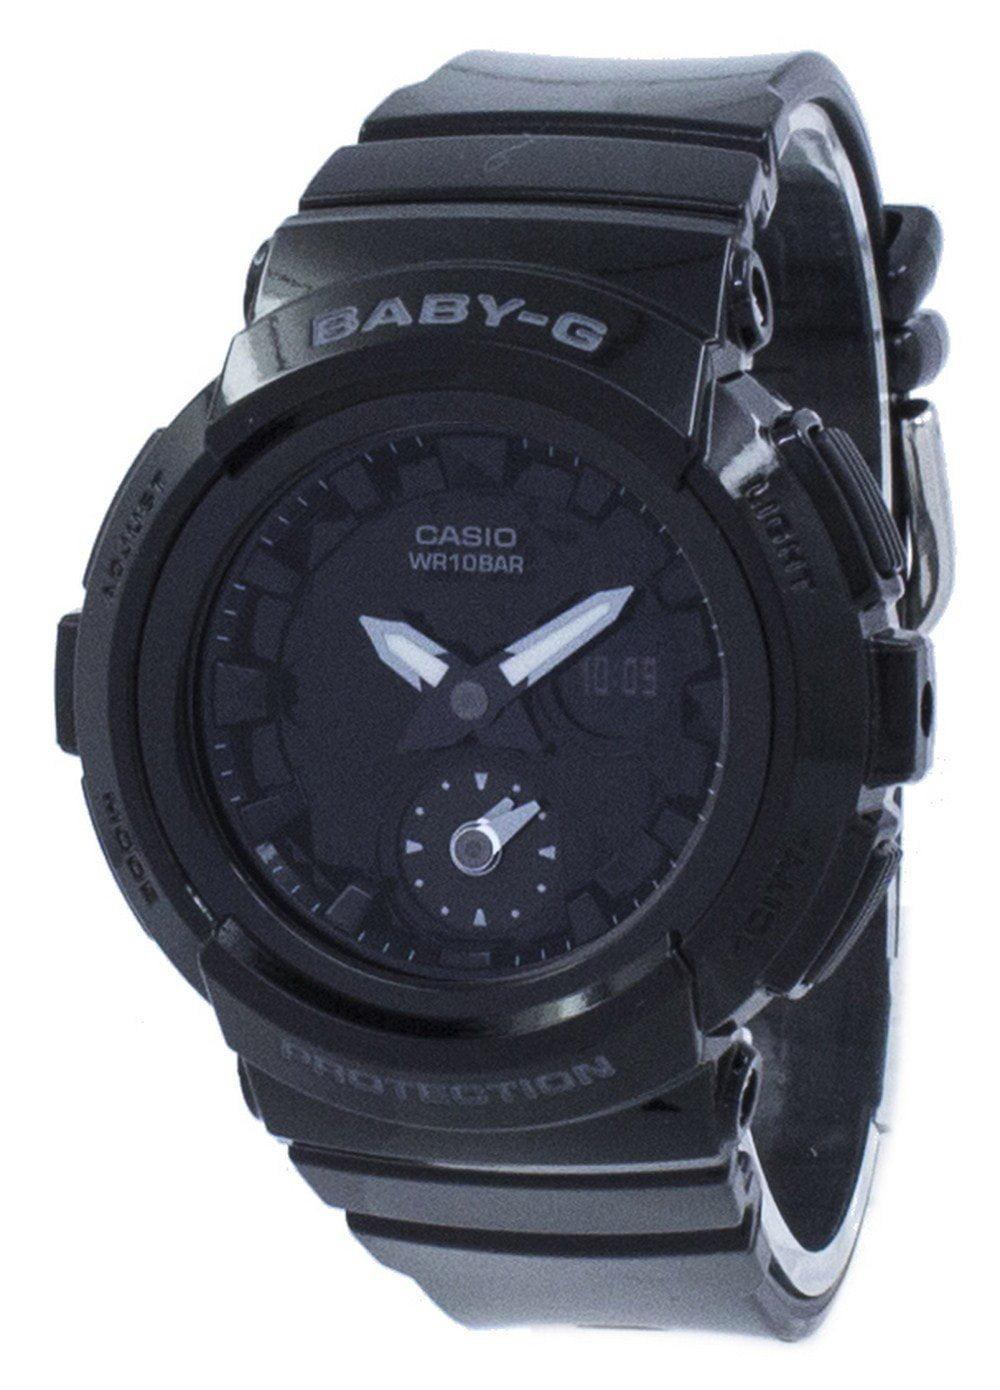 Casio Baby-G Shock Resistant Analog Digital BGA-195-1A BGA195-1A Womens Watch